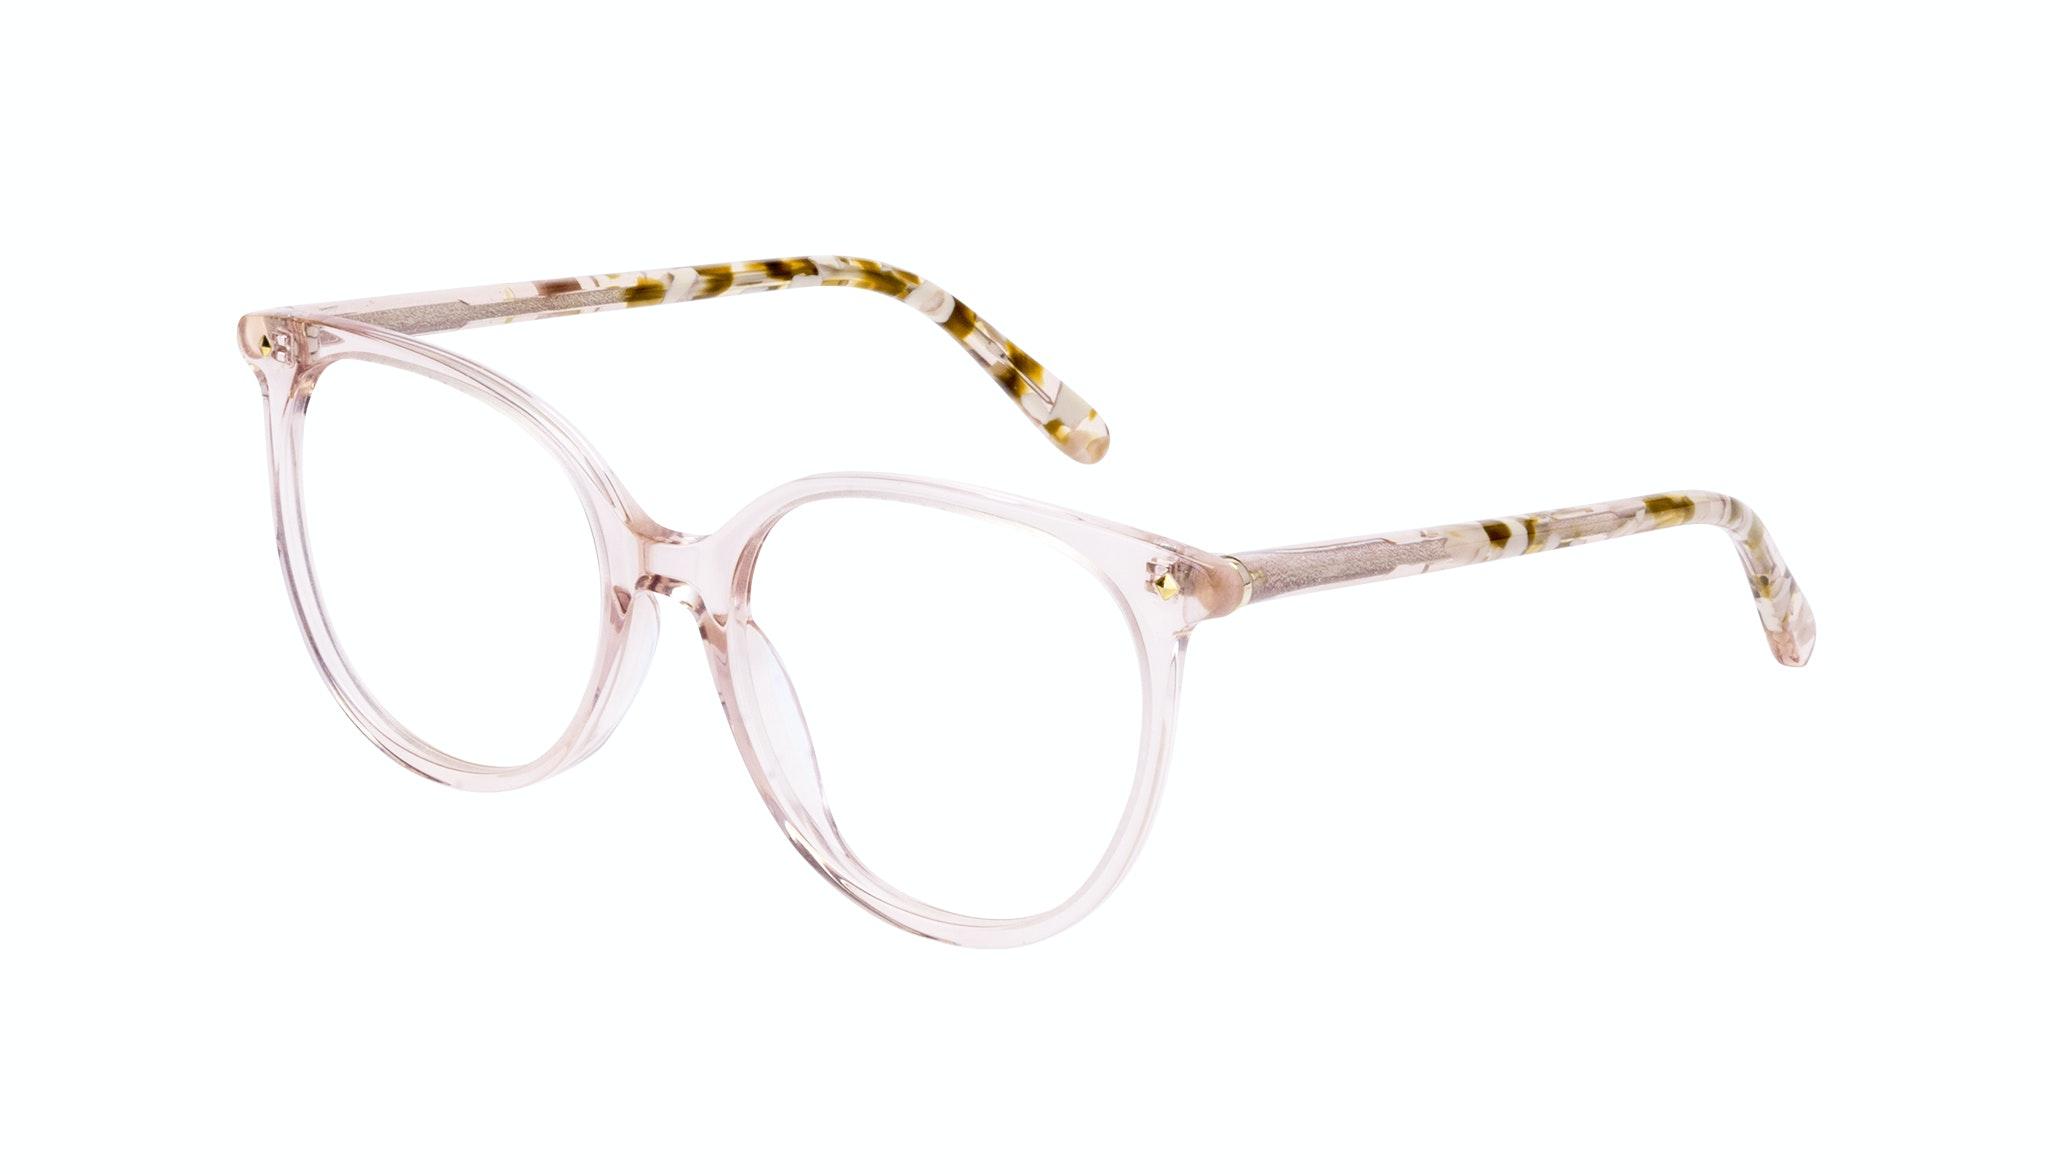 Affordable Fashion Glasses Round Eyeglasses Women Area Petite Rose Tilt